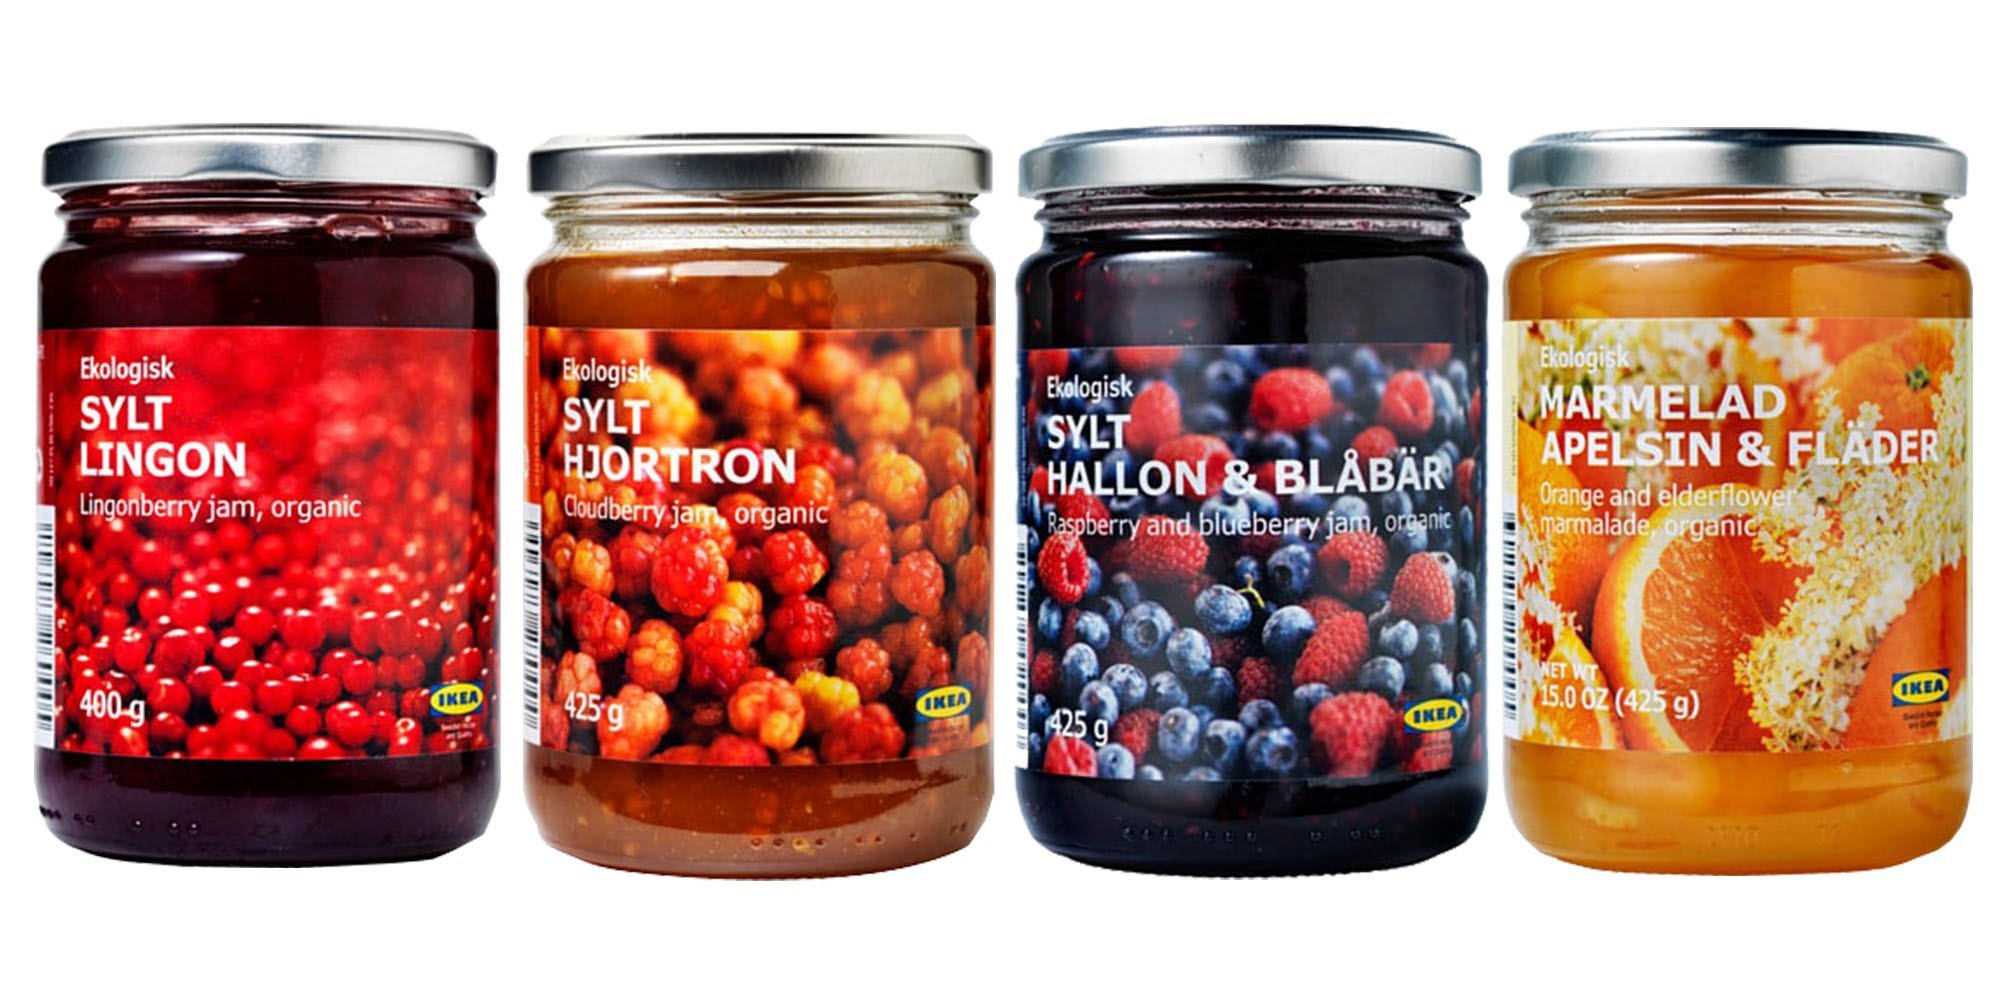 Ikea Organic Jam Bundle - Includes Total 4 Preserves - 1 Lingonberry Organic Preserve, 1 Raspberry & blueberry organic jam, 1 Cloudberry jam and 1 Orange-elderflower organic marmalade